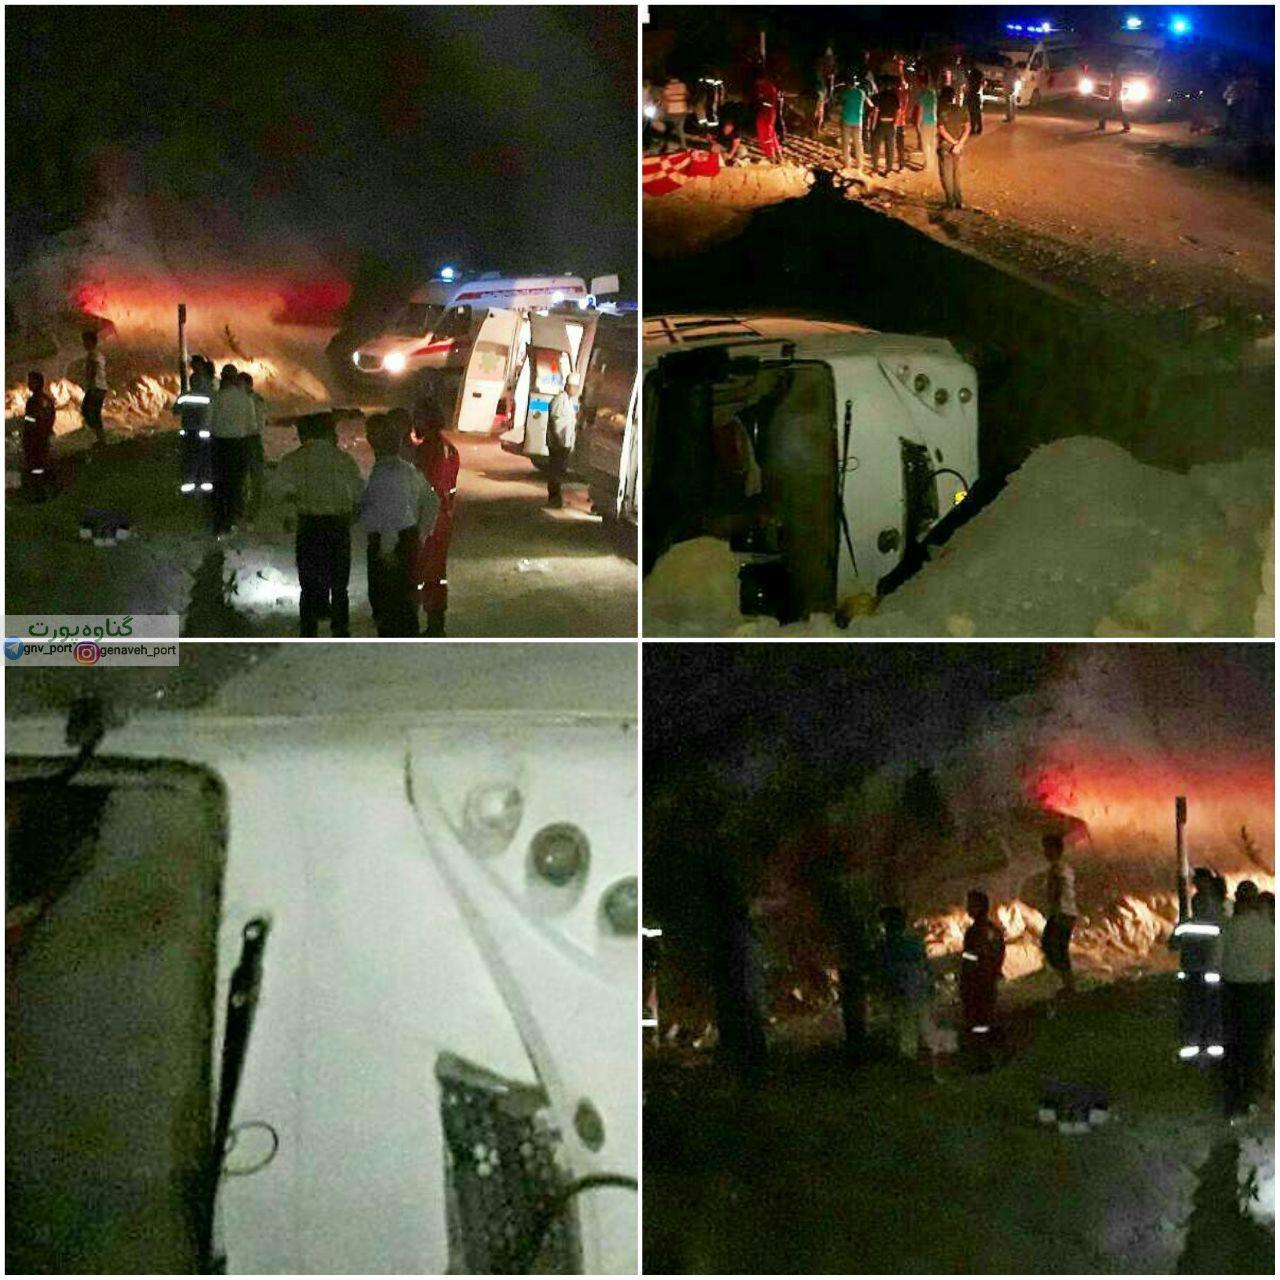 واژگونی اتوبوس در گچساران (+عکس)/ 2 کشته و 15 زخمی